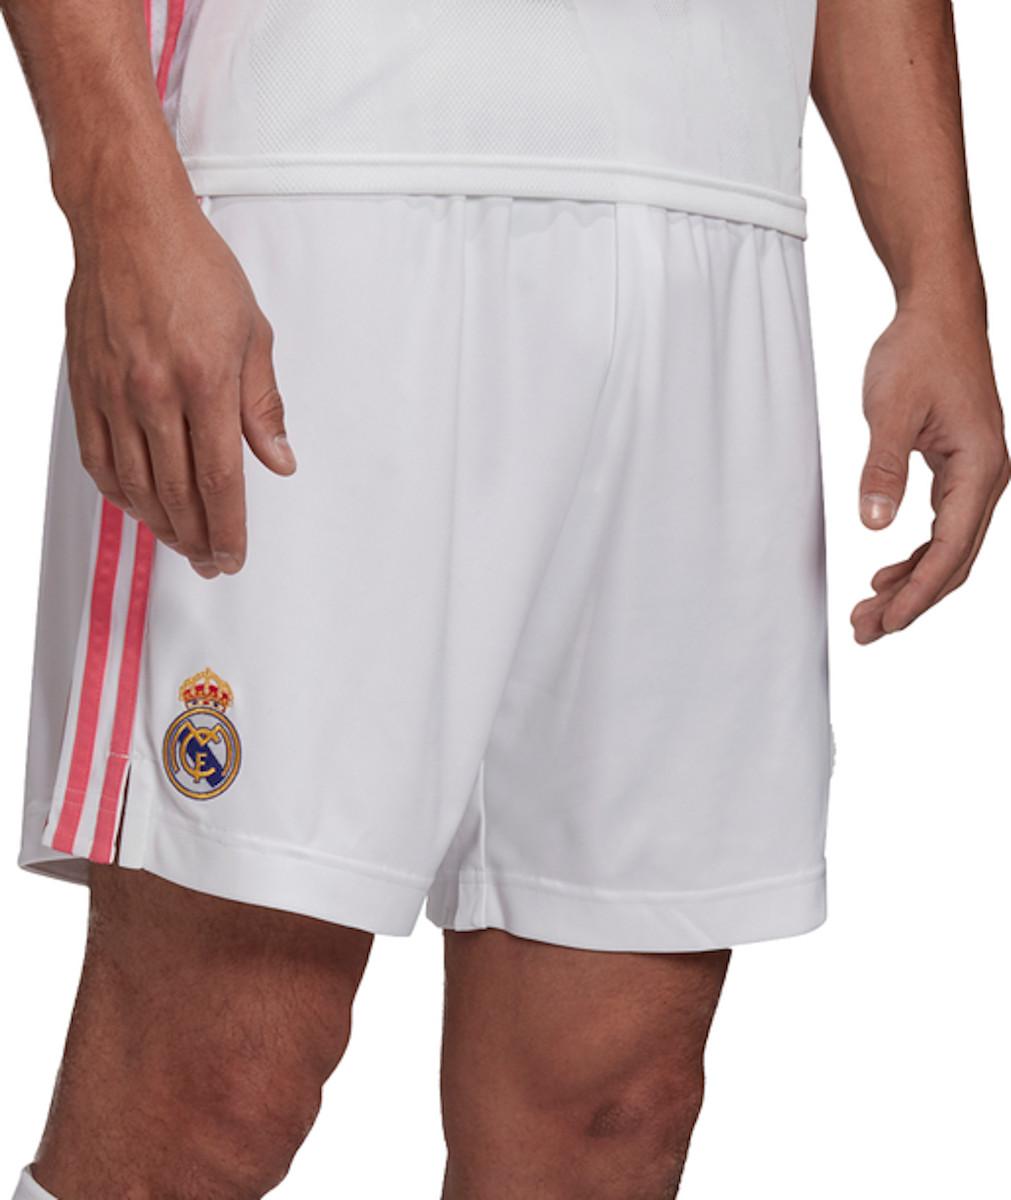 Šortky adidas REAL MADRID HOME SHORT 2020/21